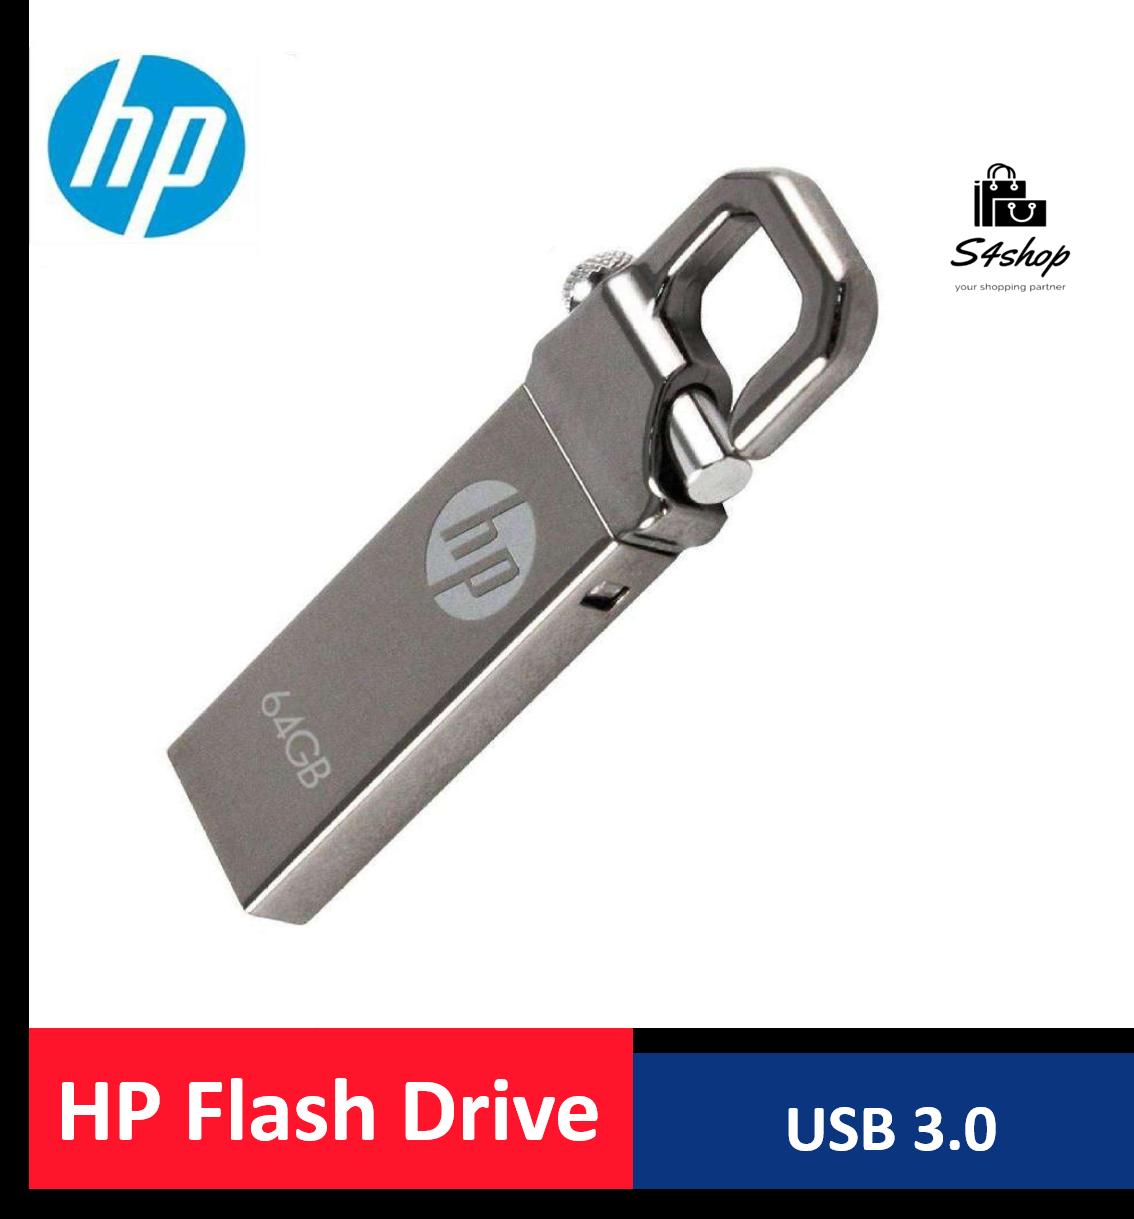 HP USB 64 GB Flash Drive  64 GB HP USB  HP USB Flash Drive